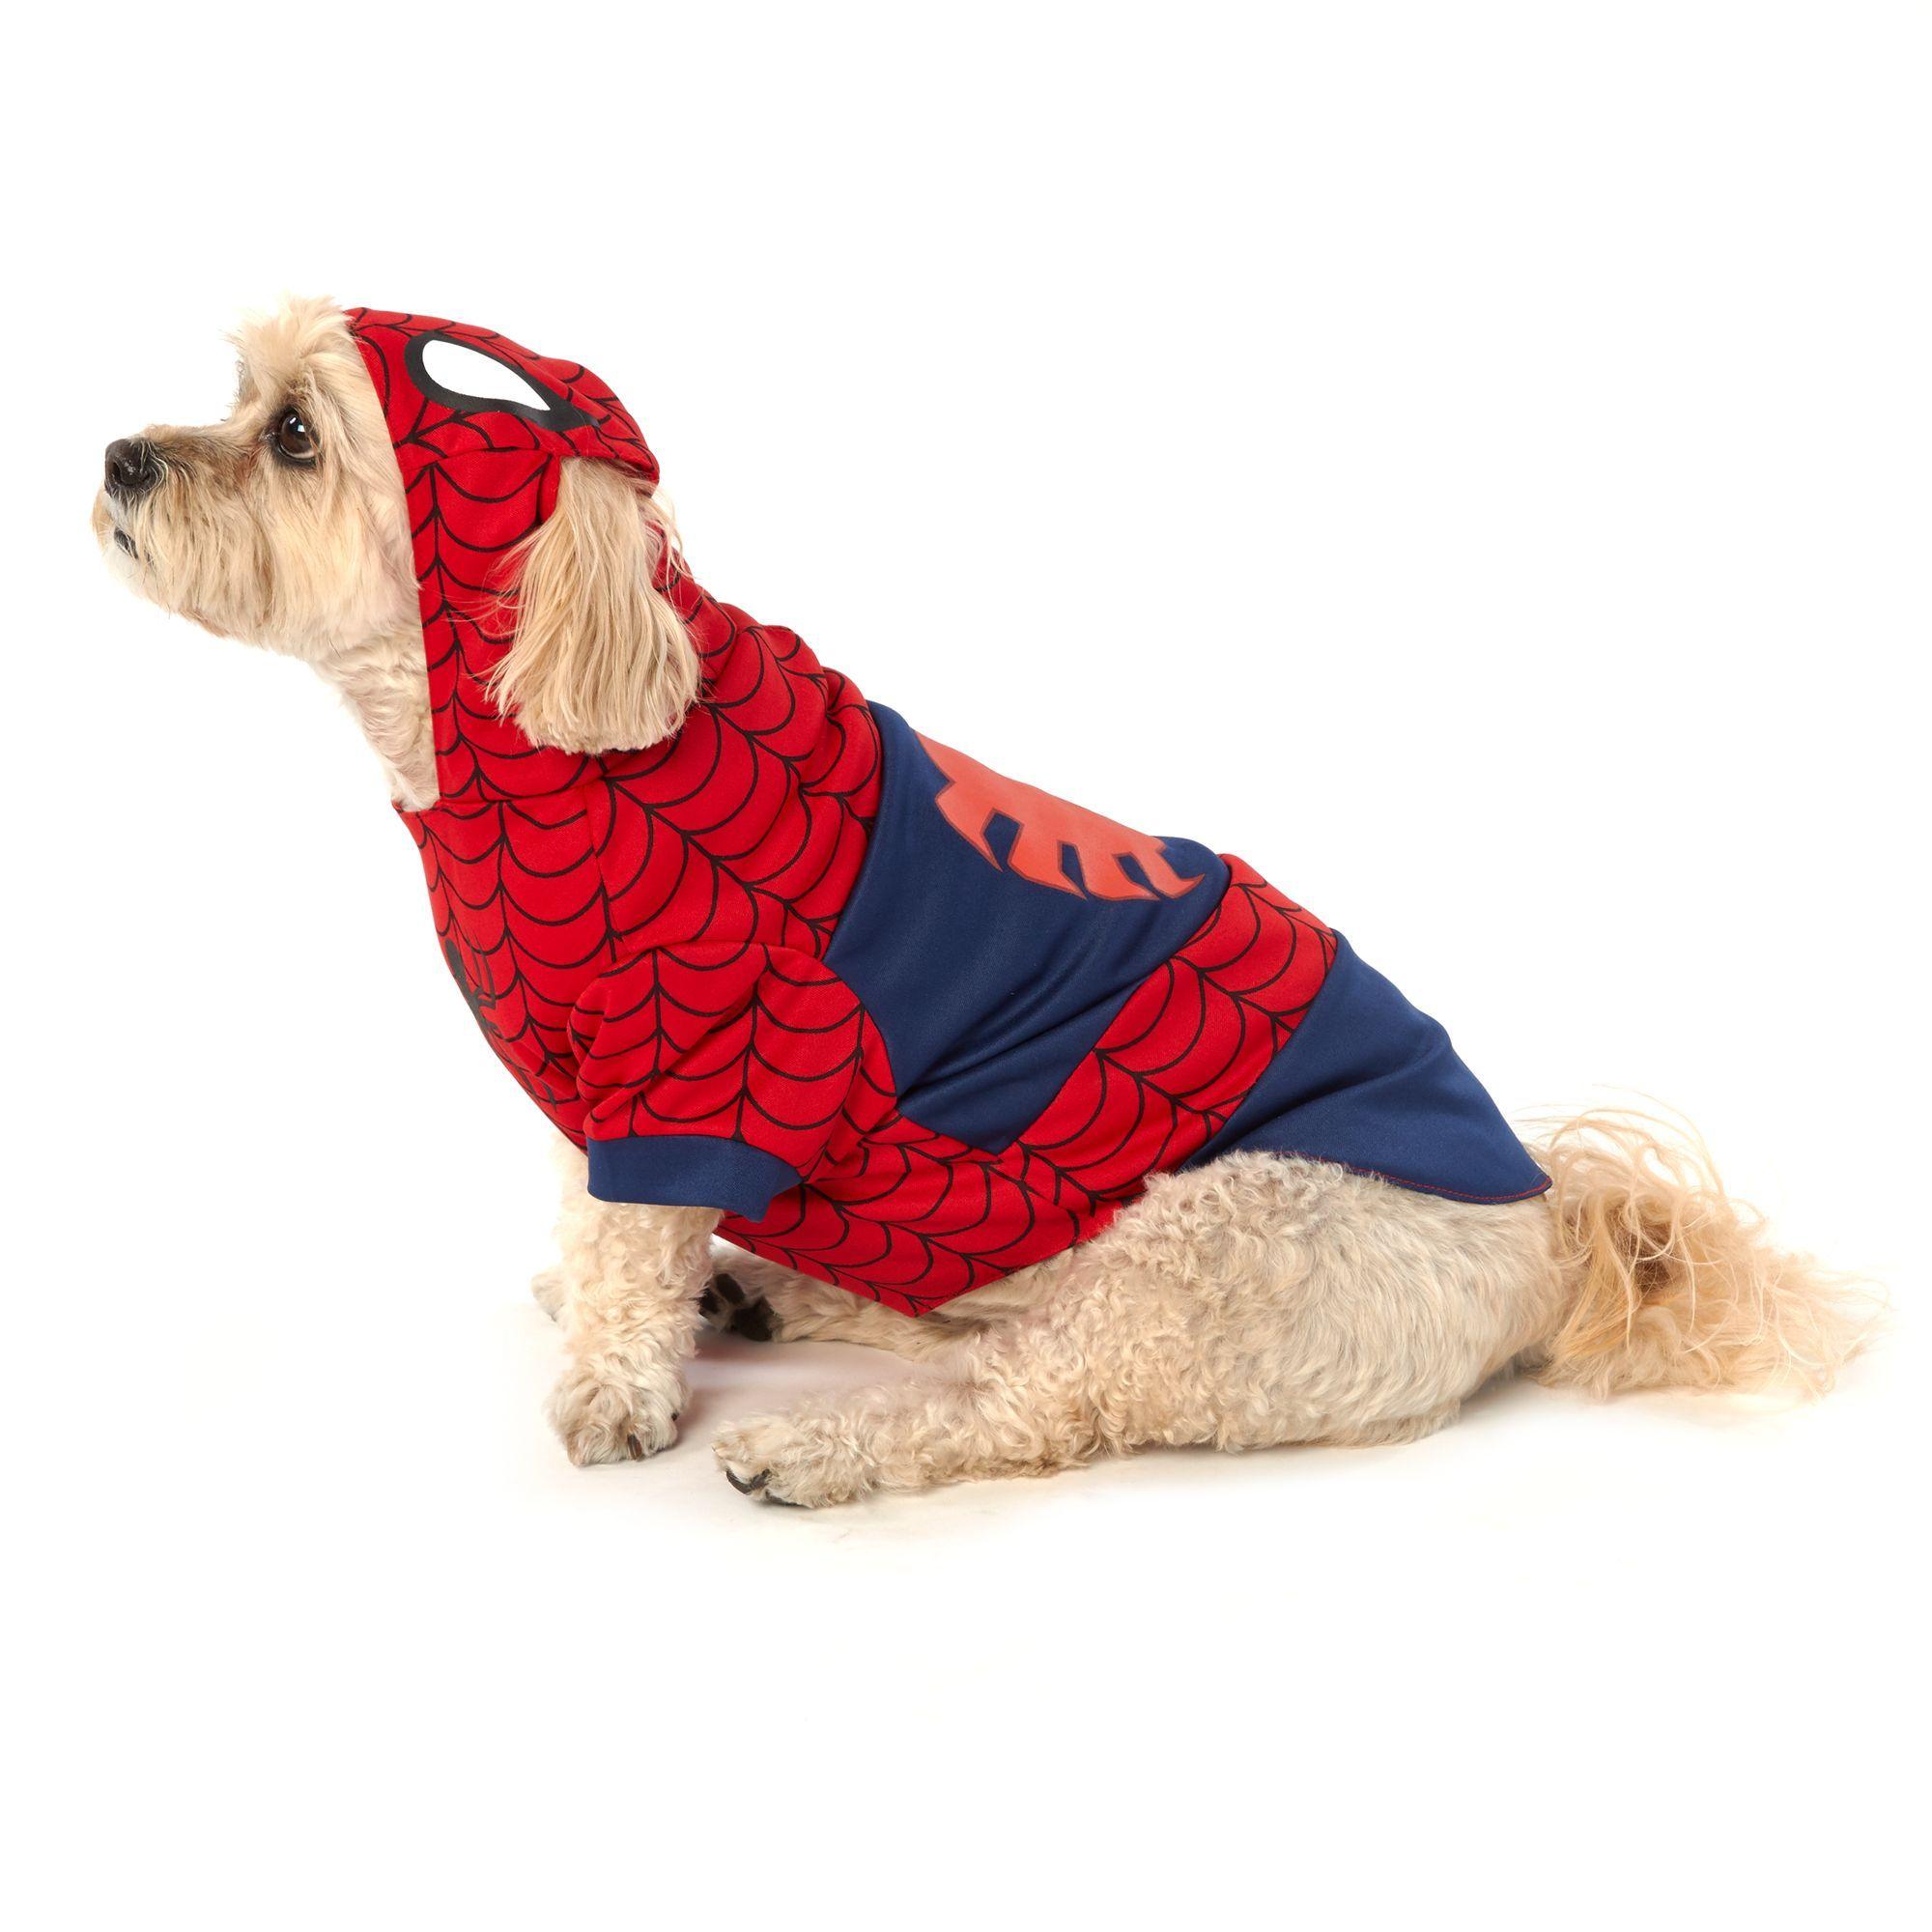 Marvel™ Comics SpiderMan Pet Costume Pet costumes for